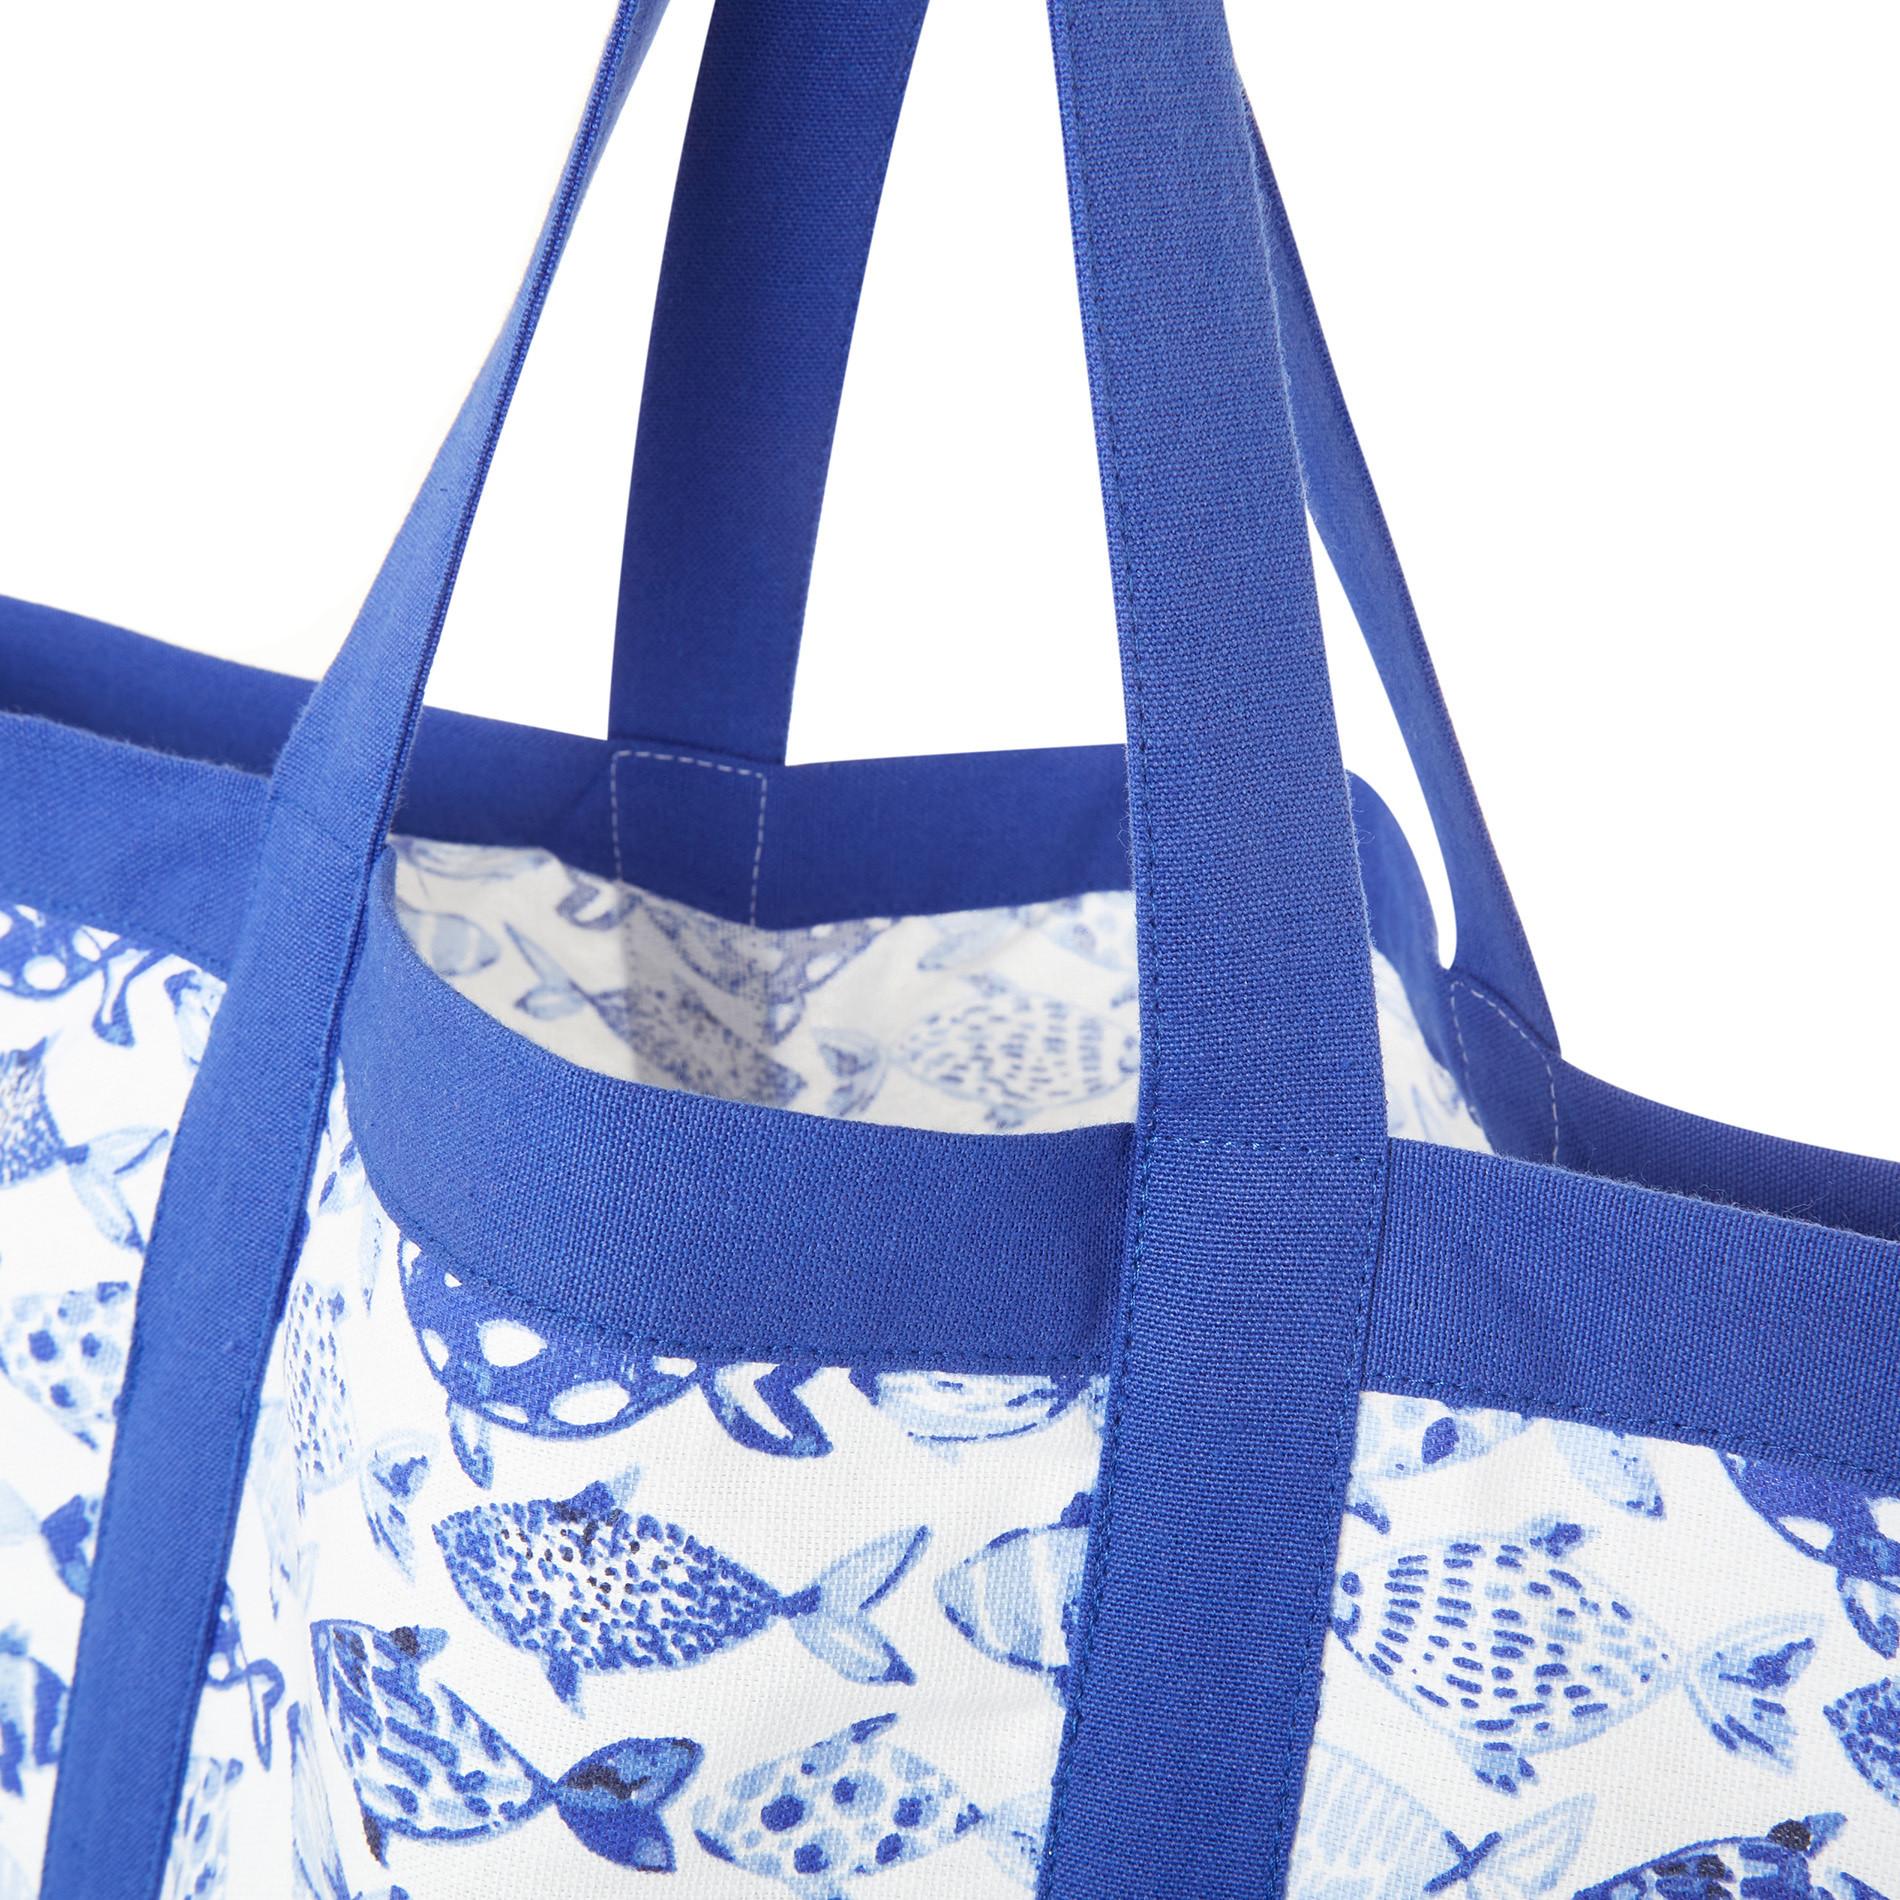 Borsa puro cotone stampa pesci, Azzurro, large image number 1